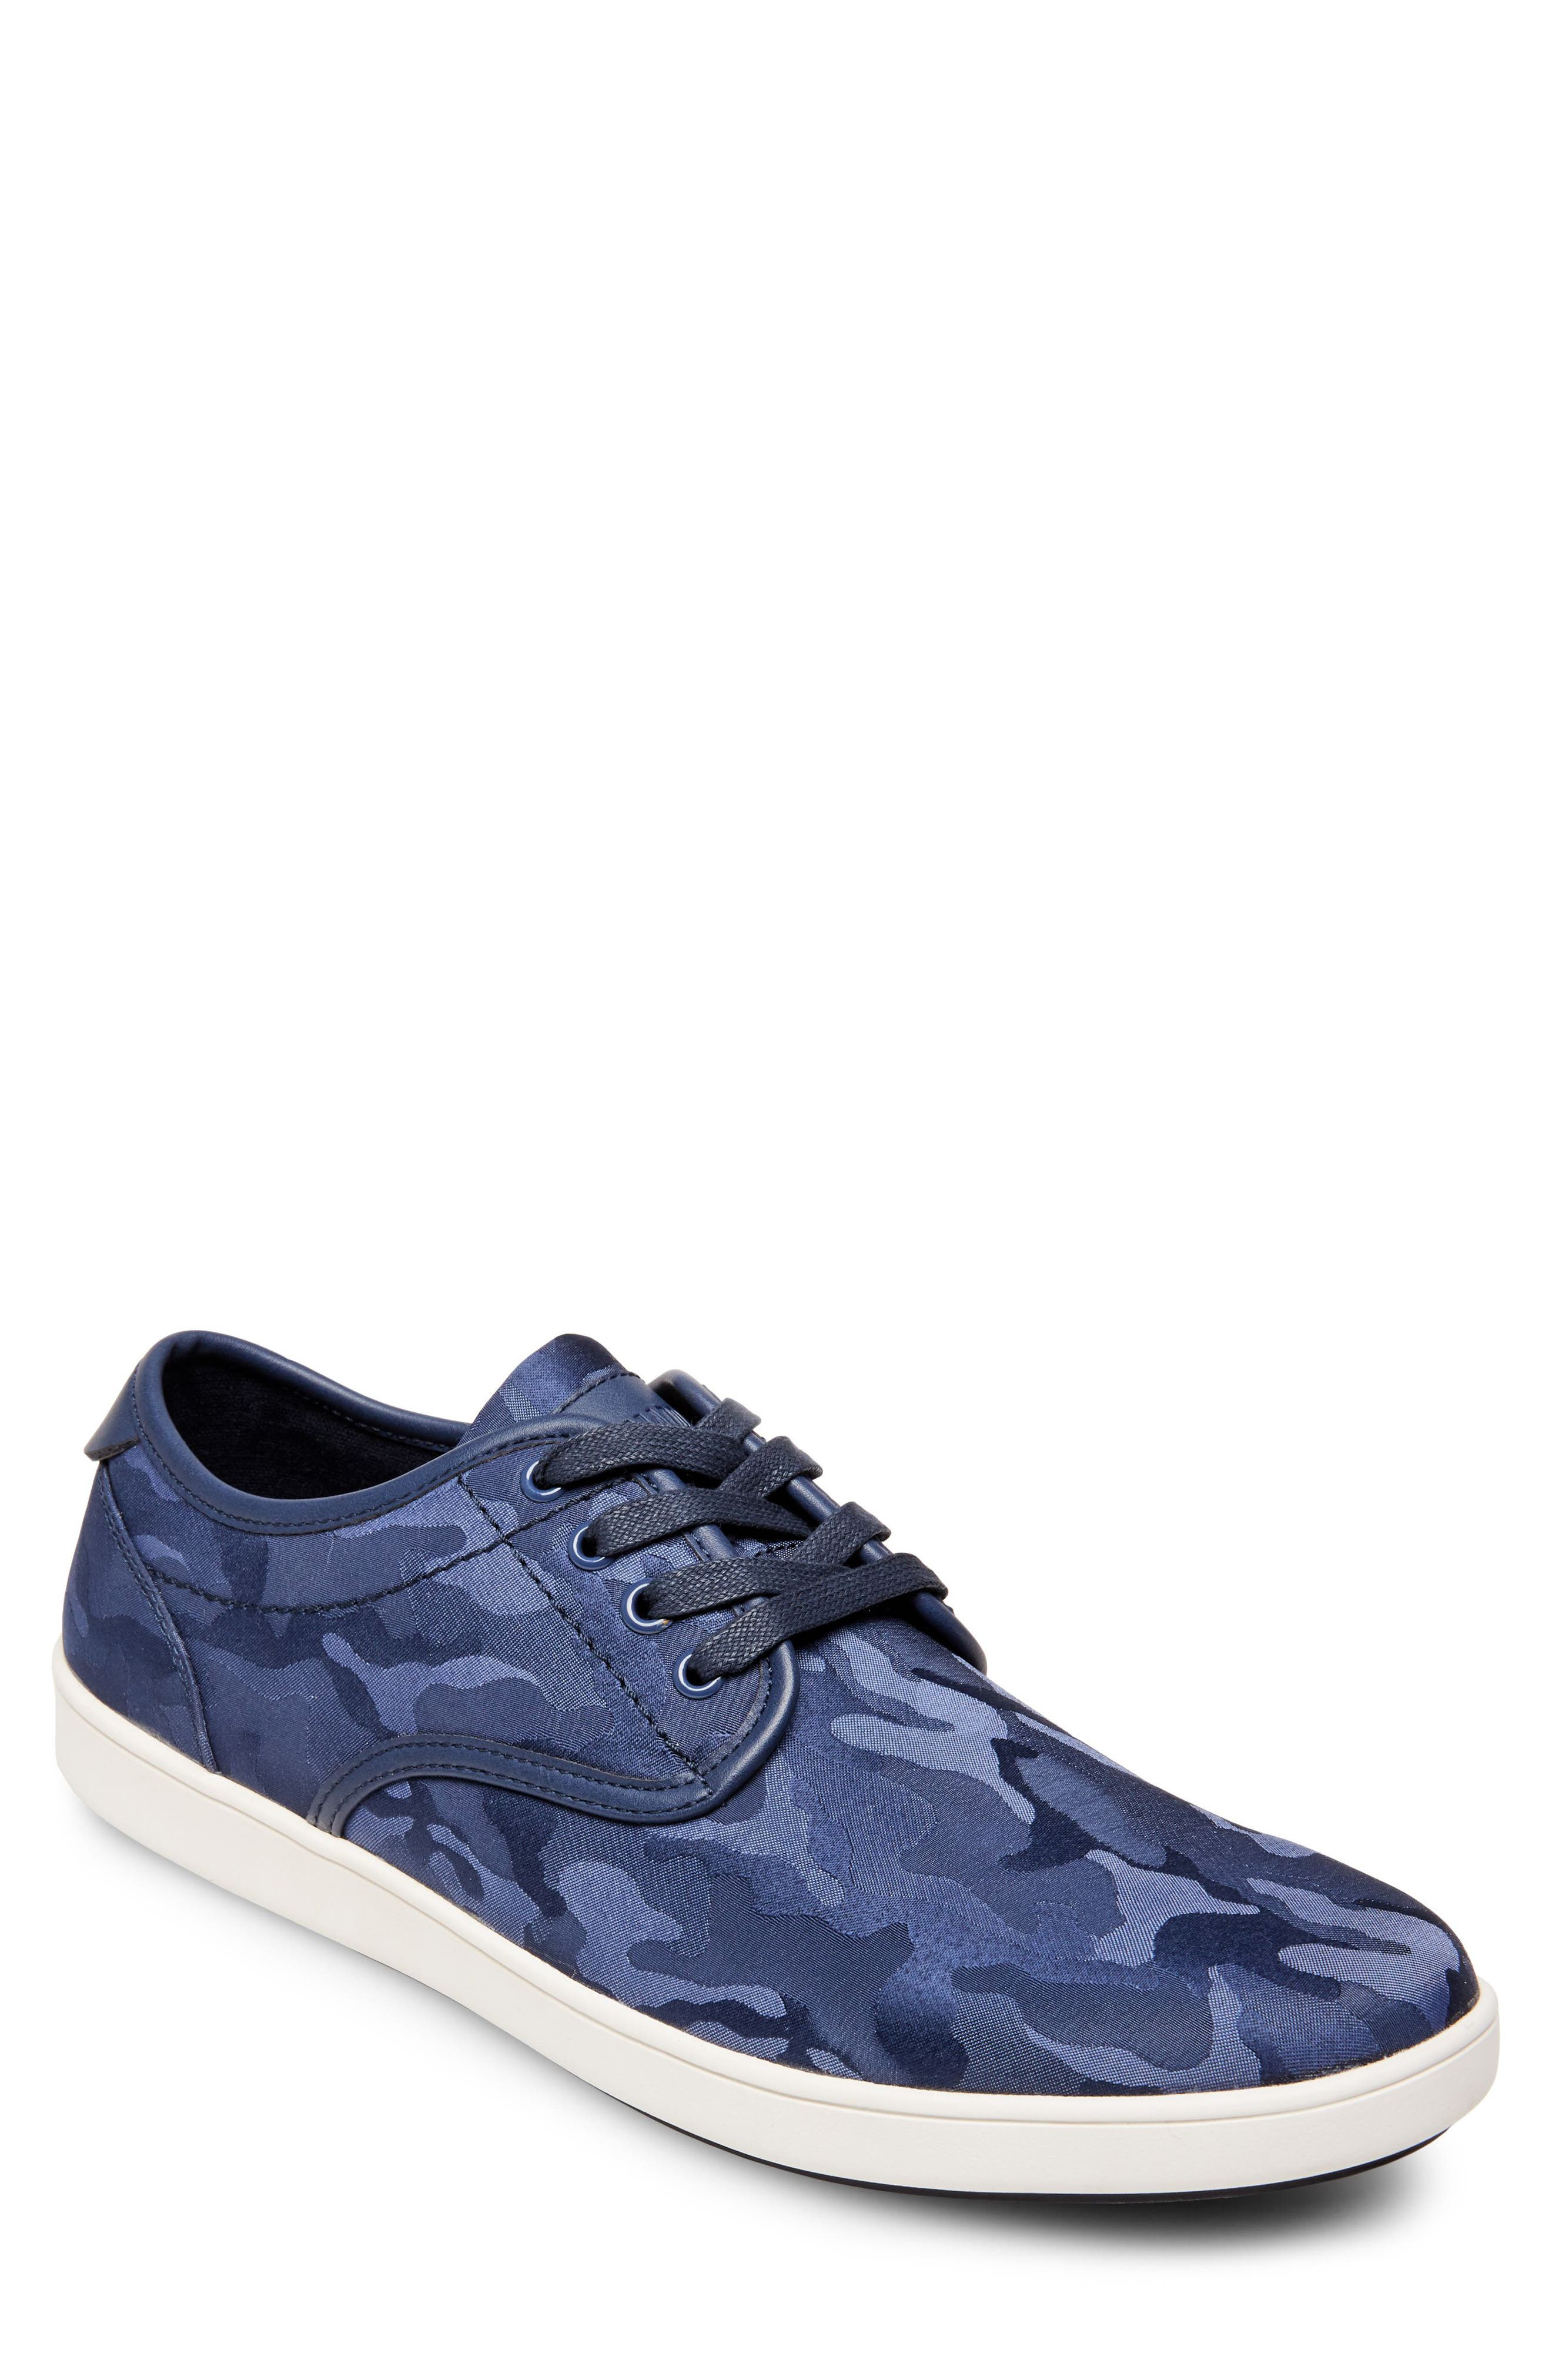 Frenzo Camo Sneaker,                         Main,                         color, Blue Camo Fabric